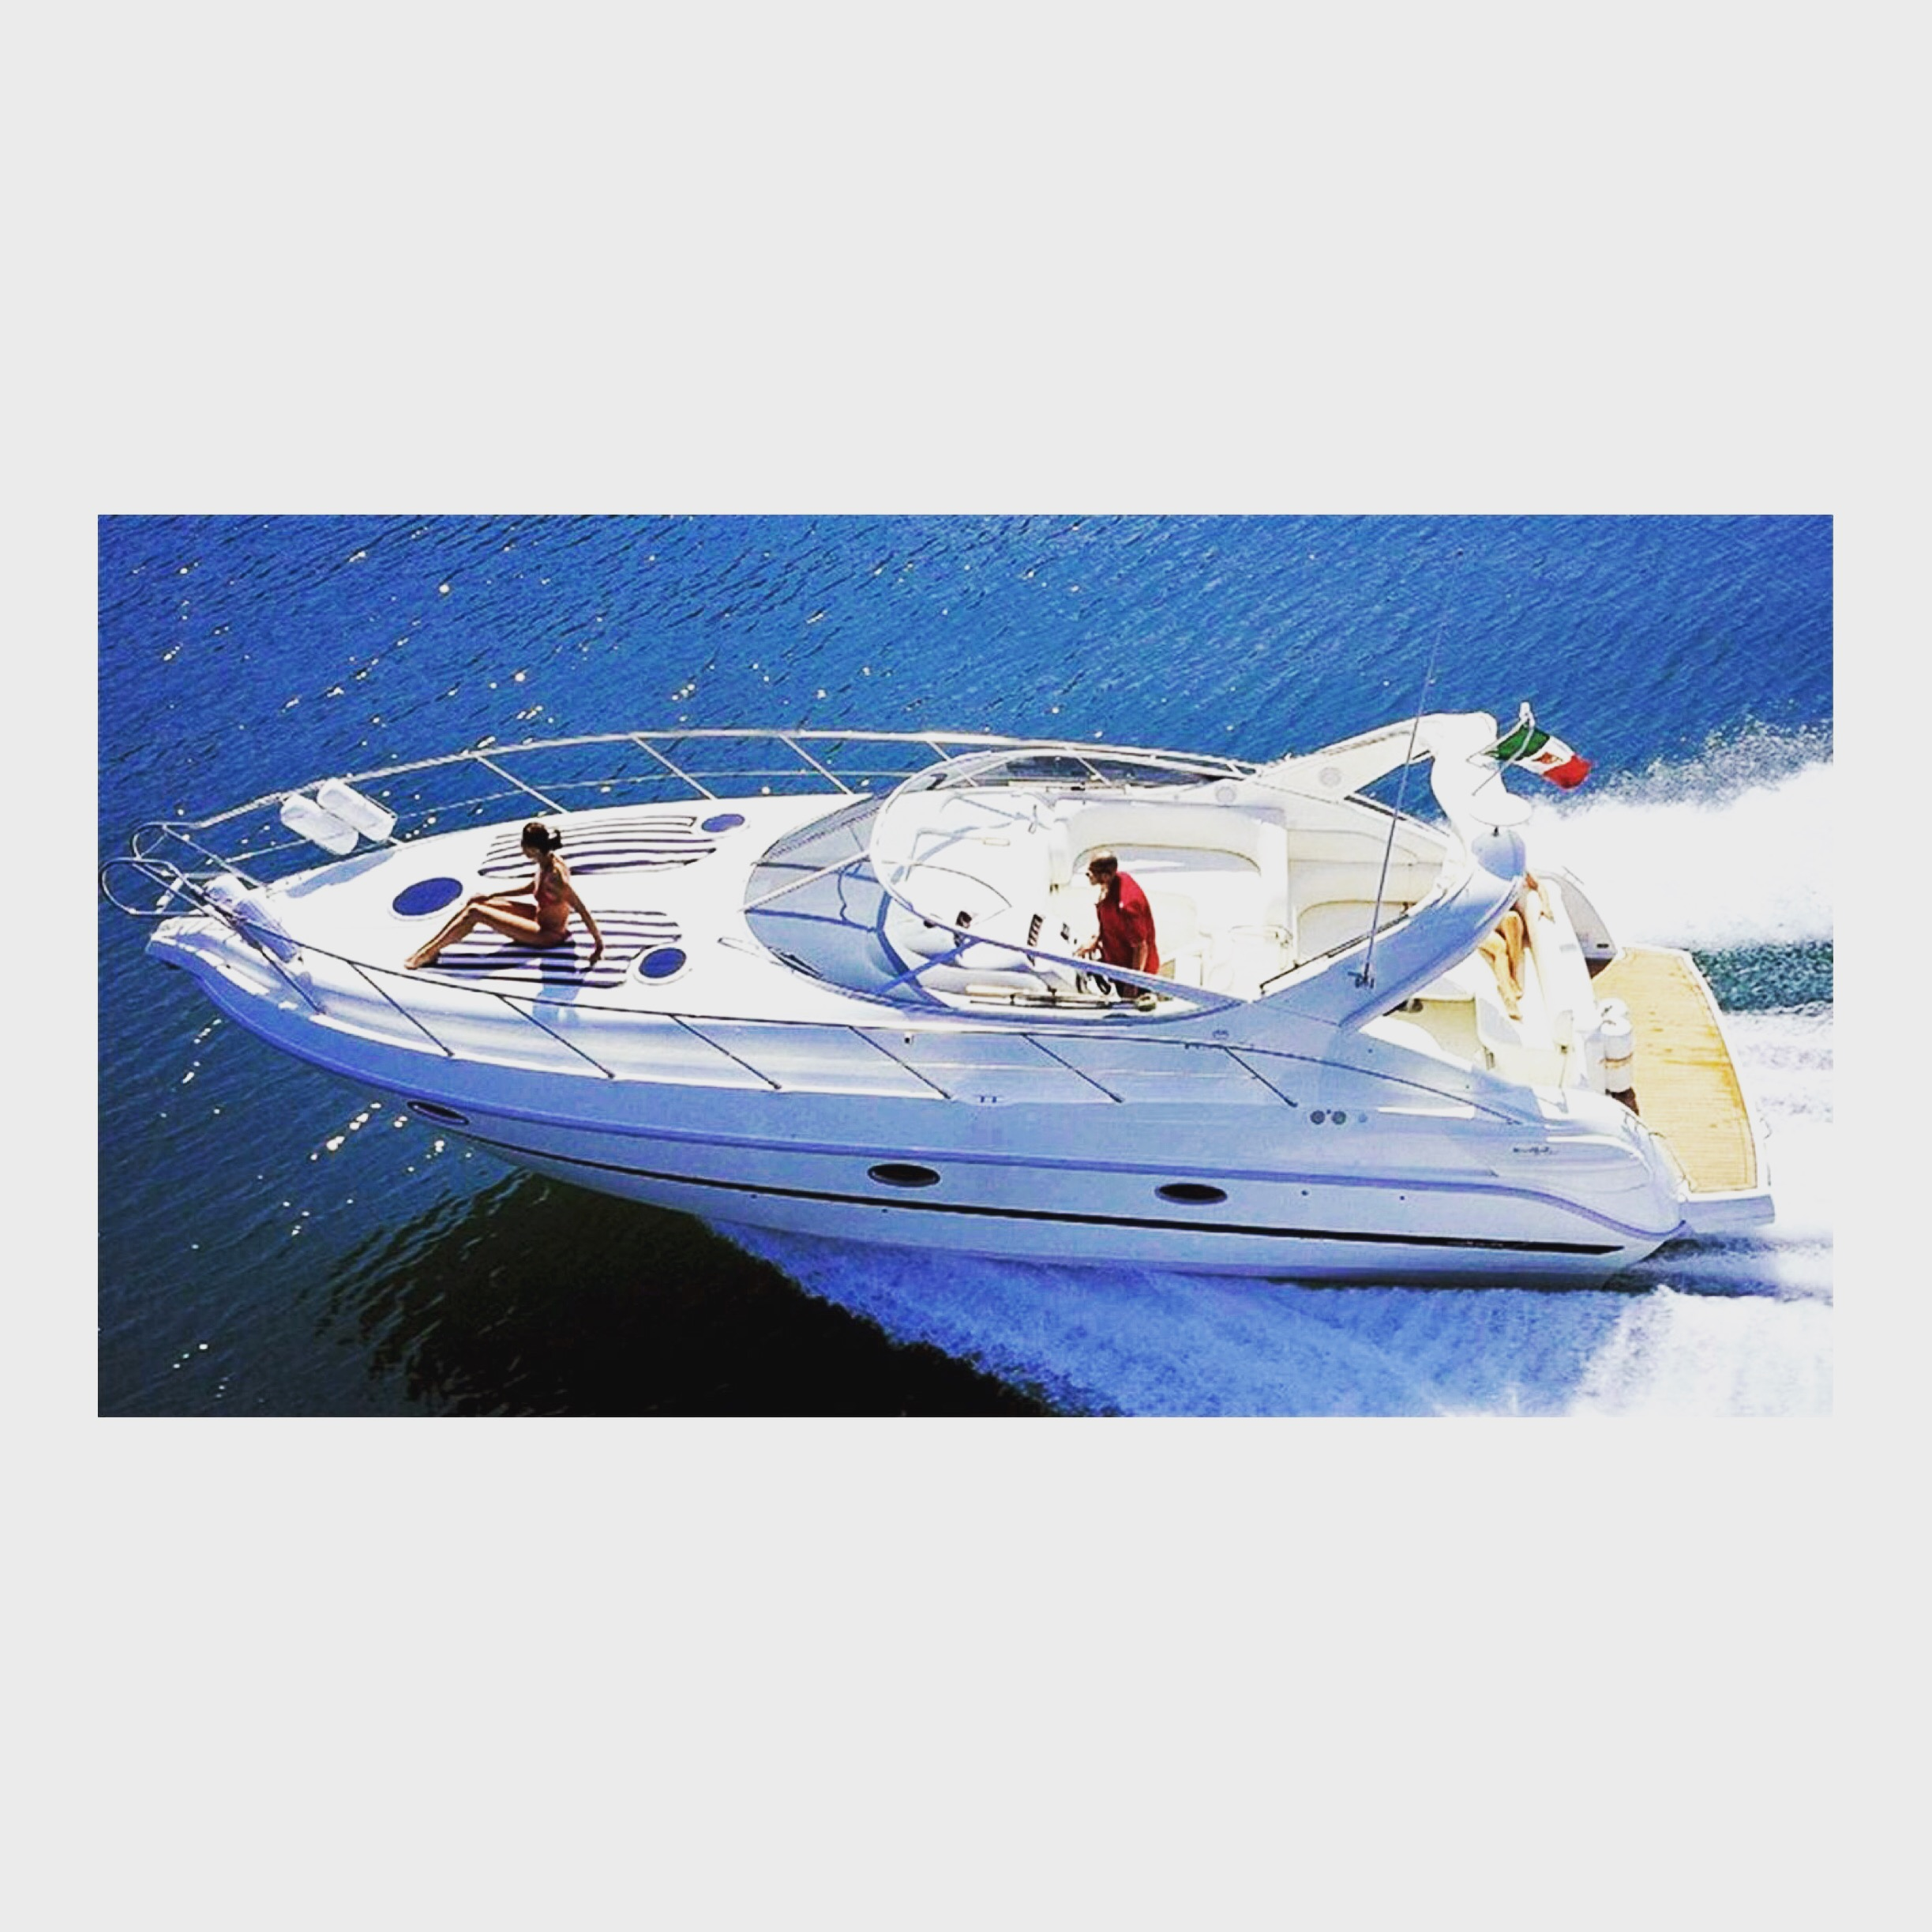 Yanpy Post 49 Yacht Cranchi Zaffiro 34 Malaga